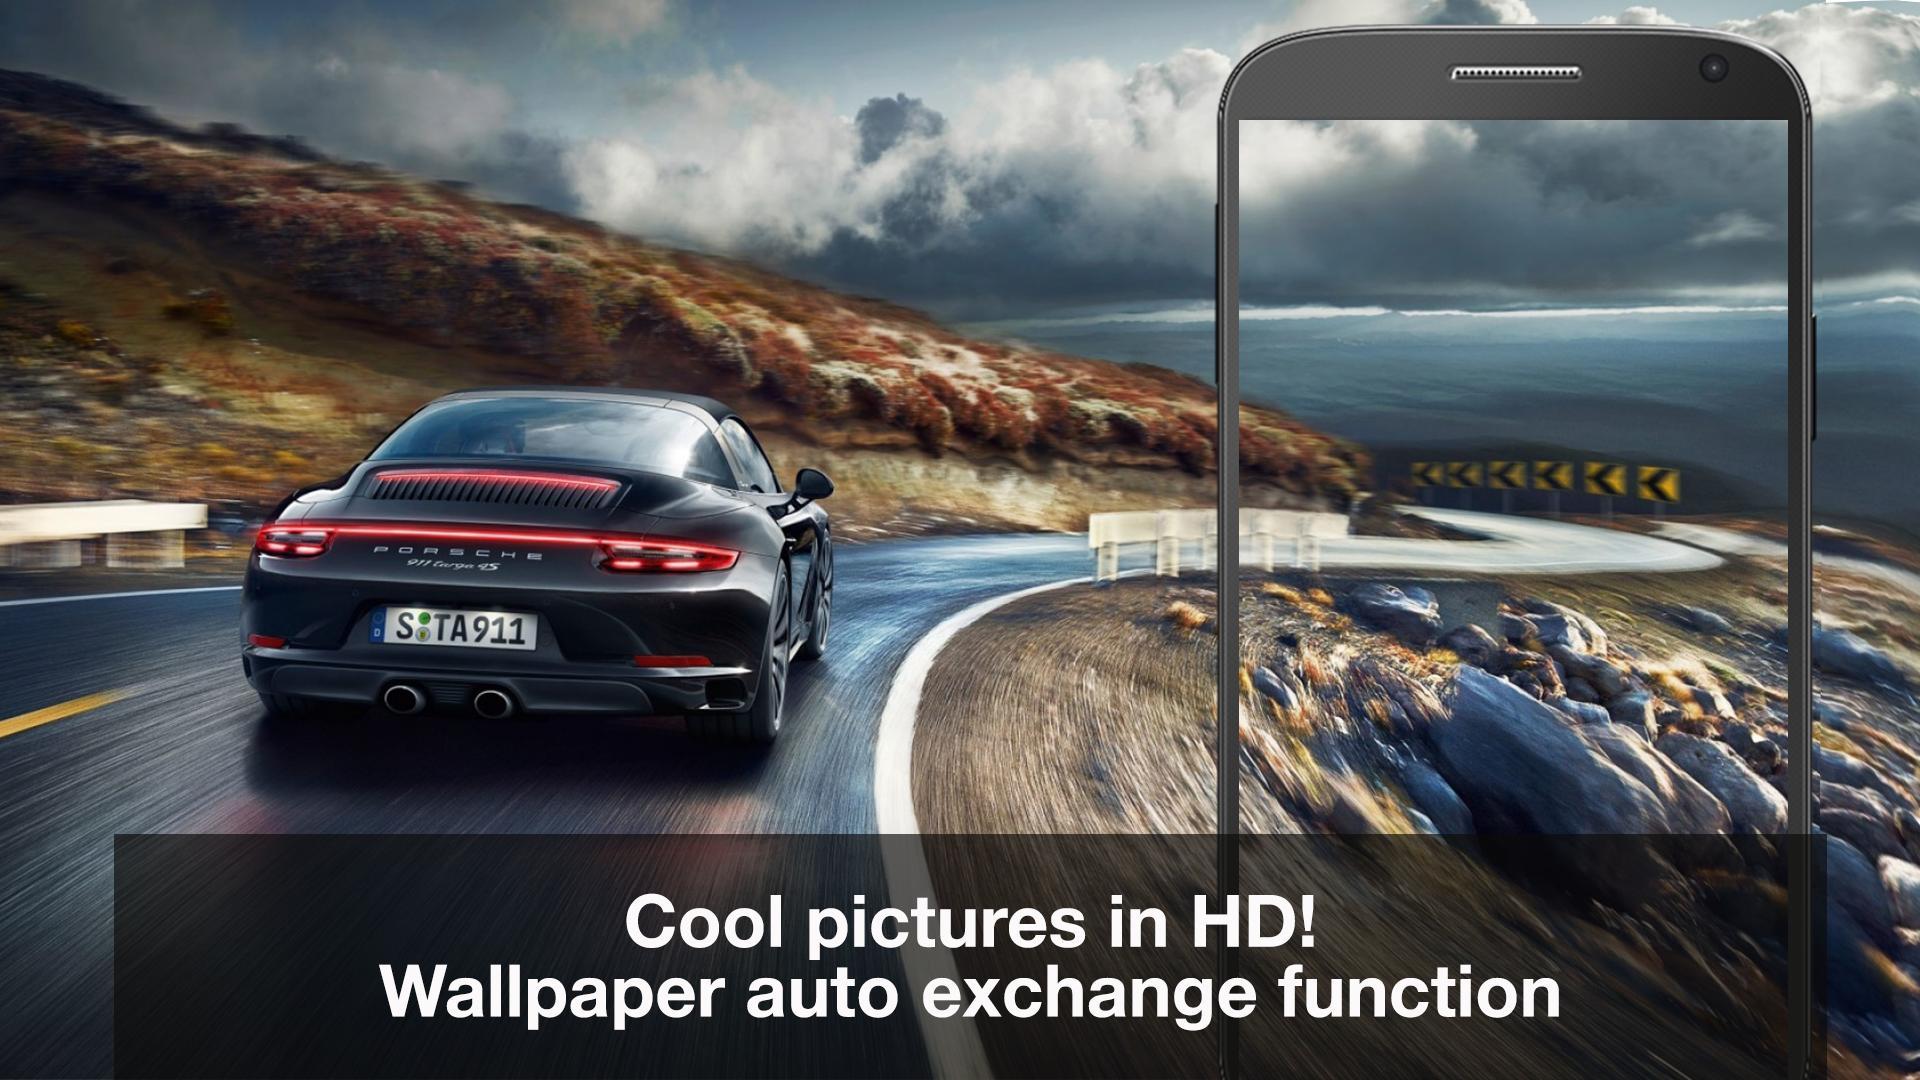 Avto Oboi Hd Mashiny Bmv Audi Mersedes I Drugie Para Android